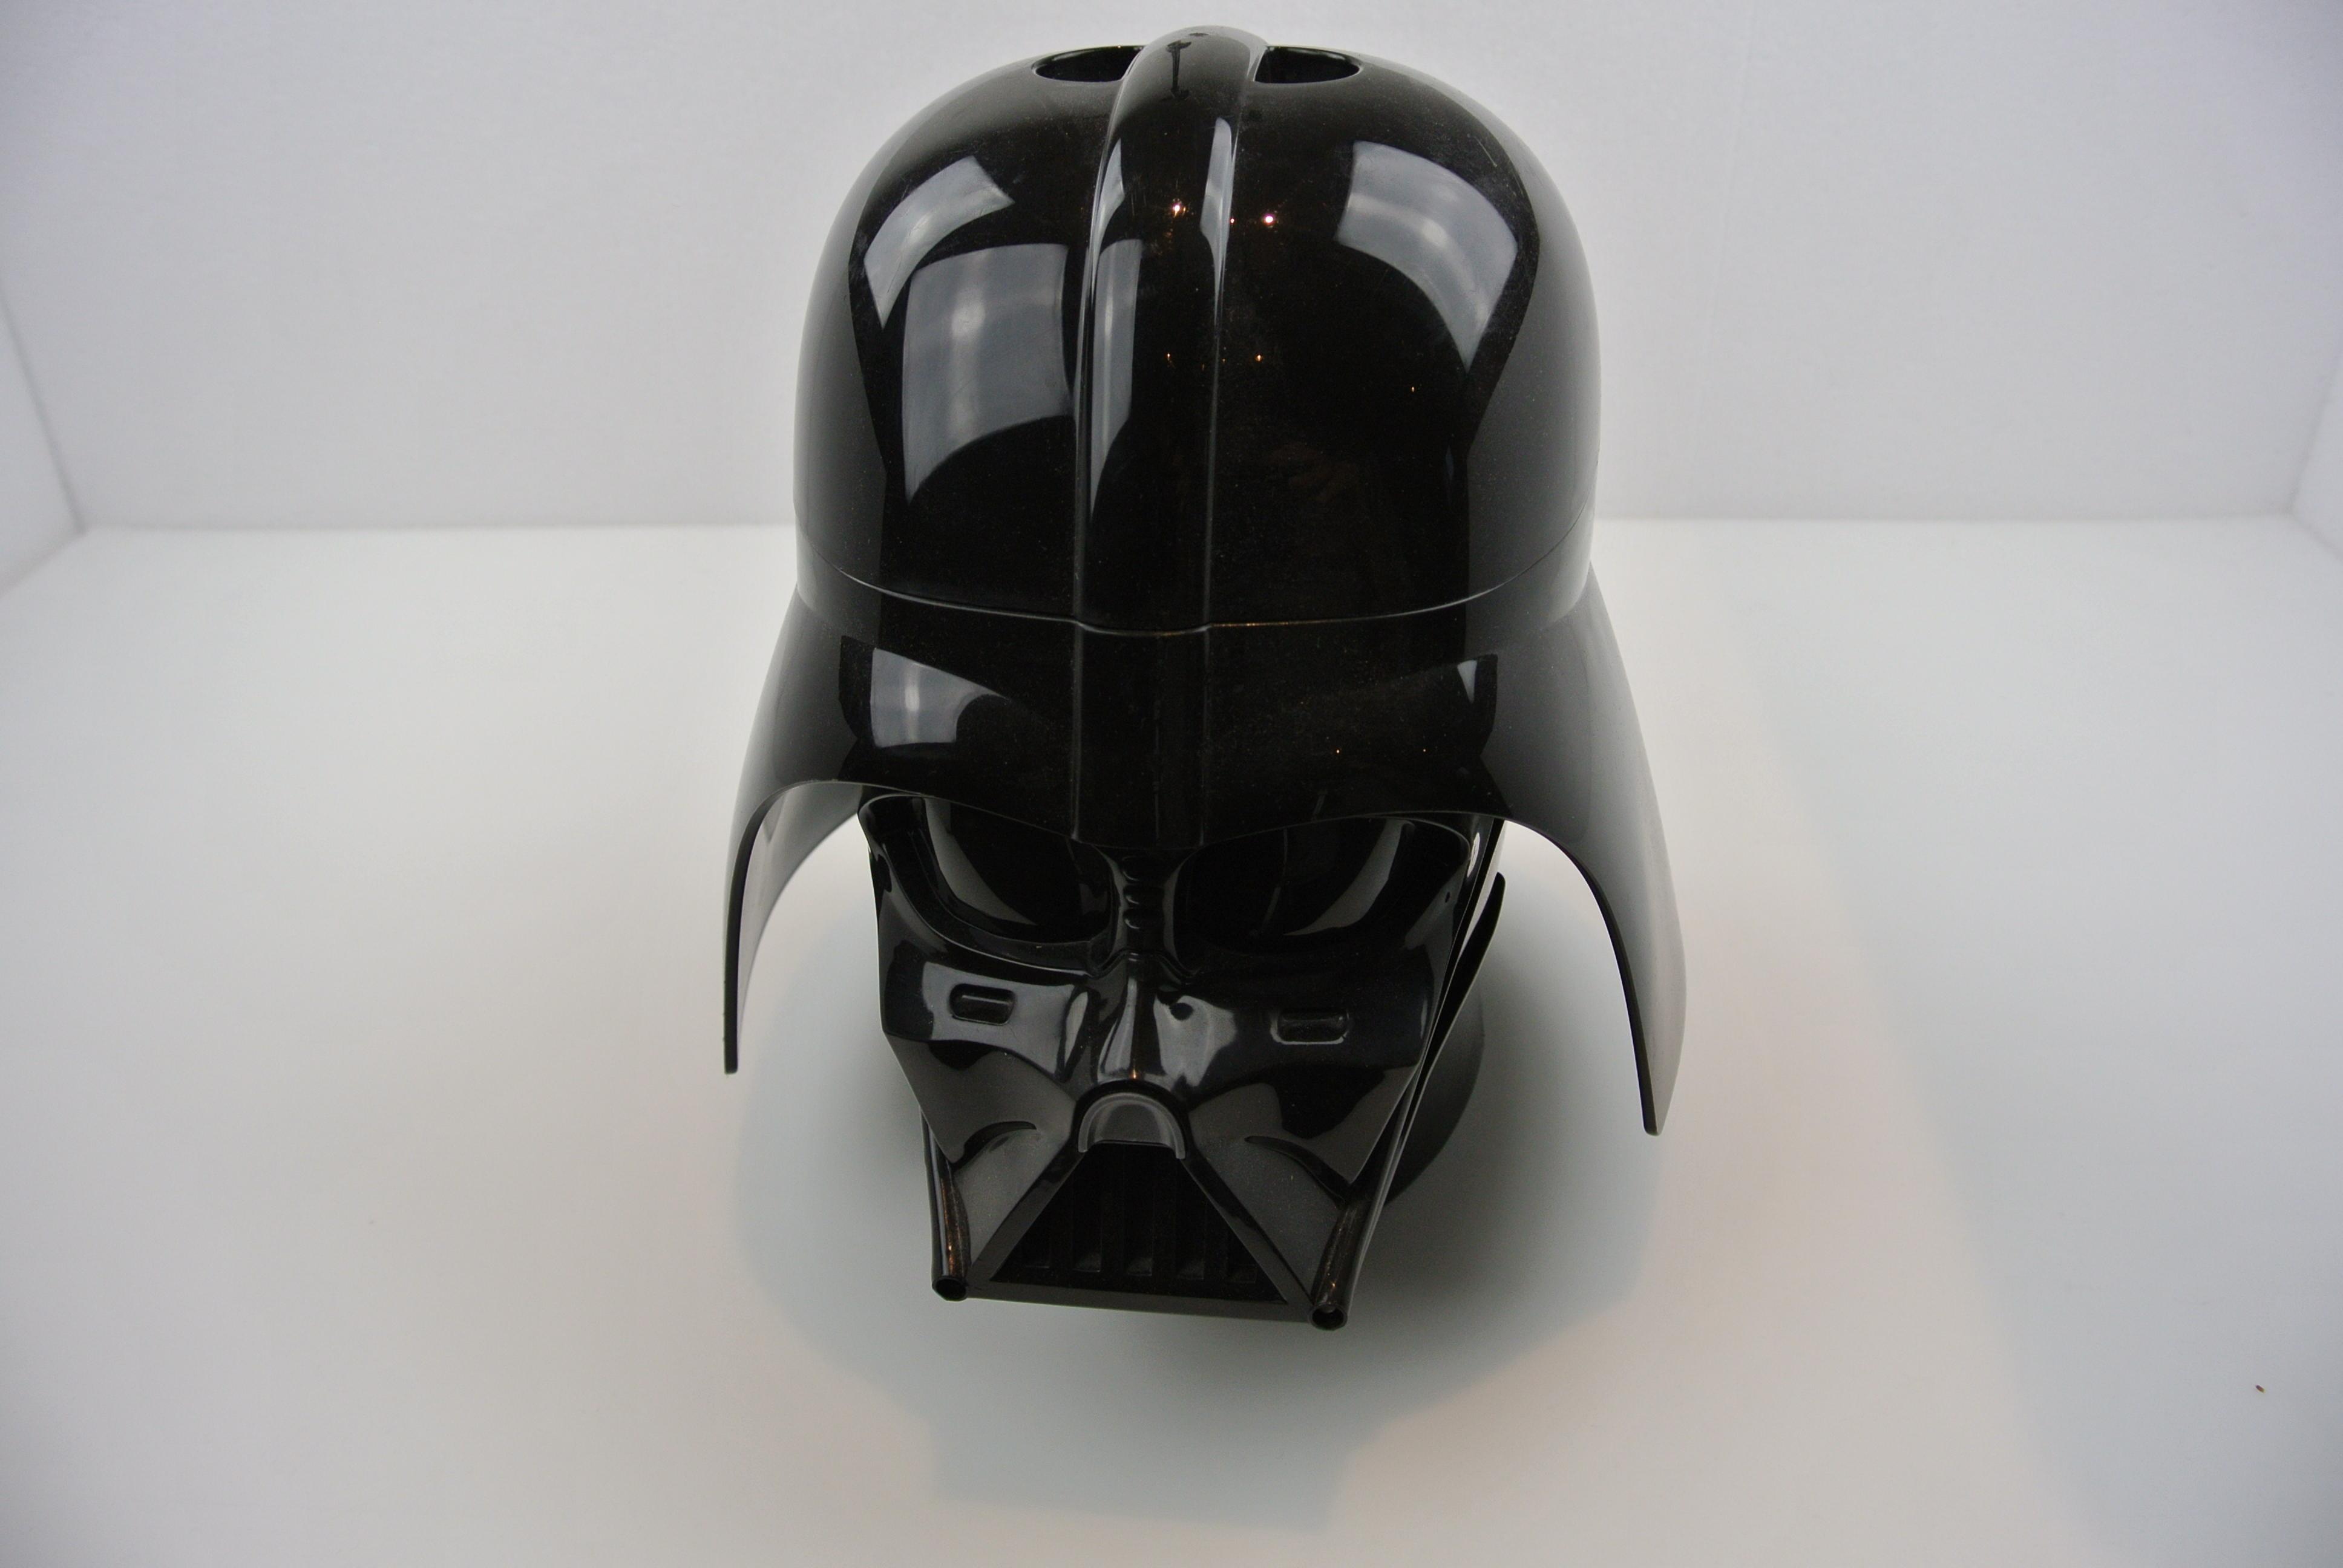 Star wars opbevarings hoved *